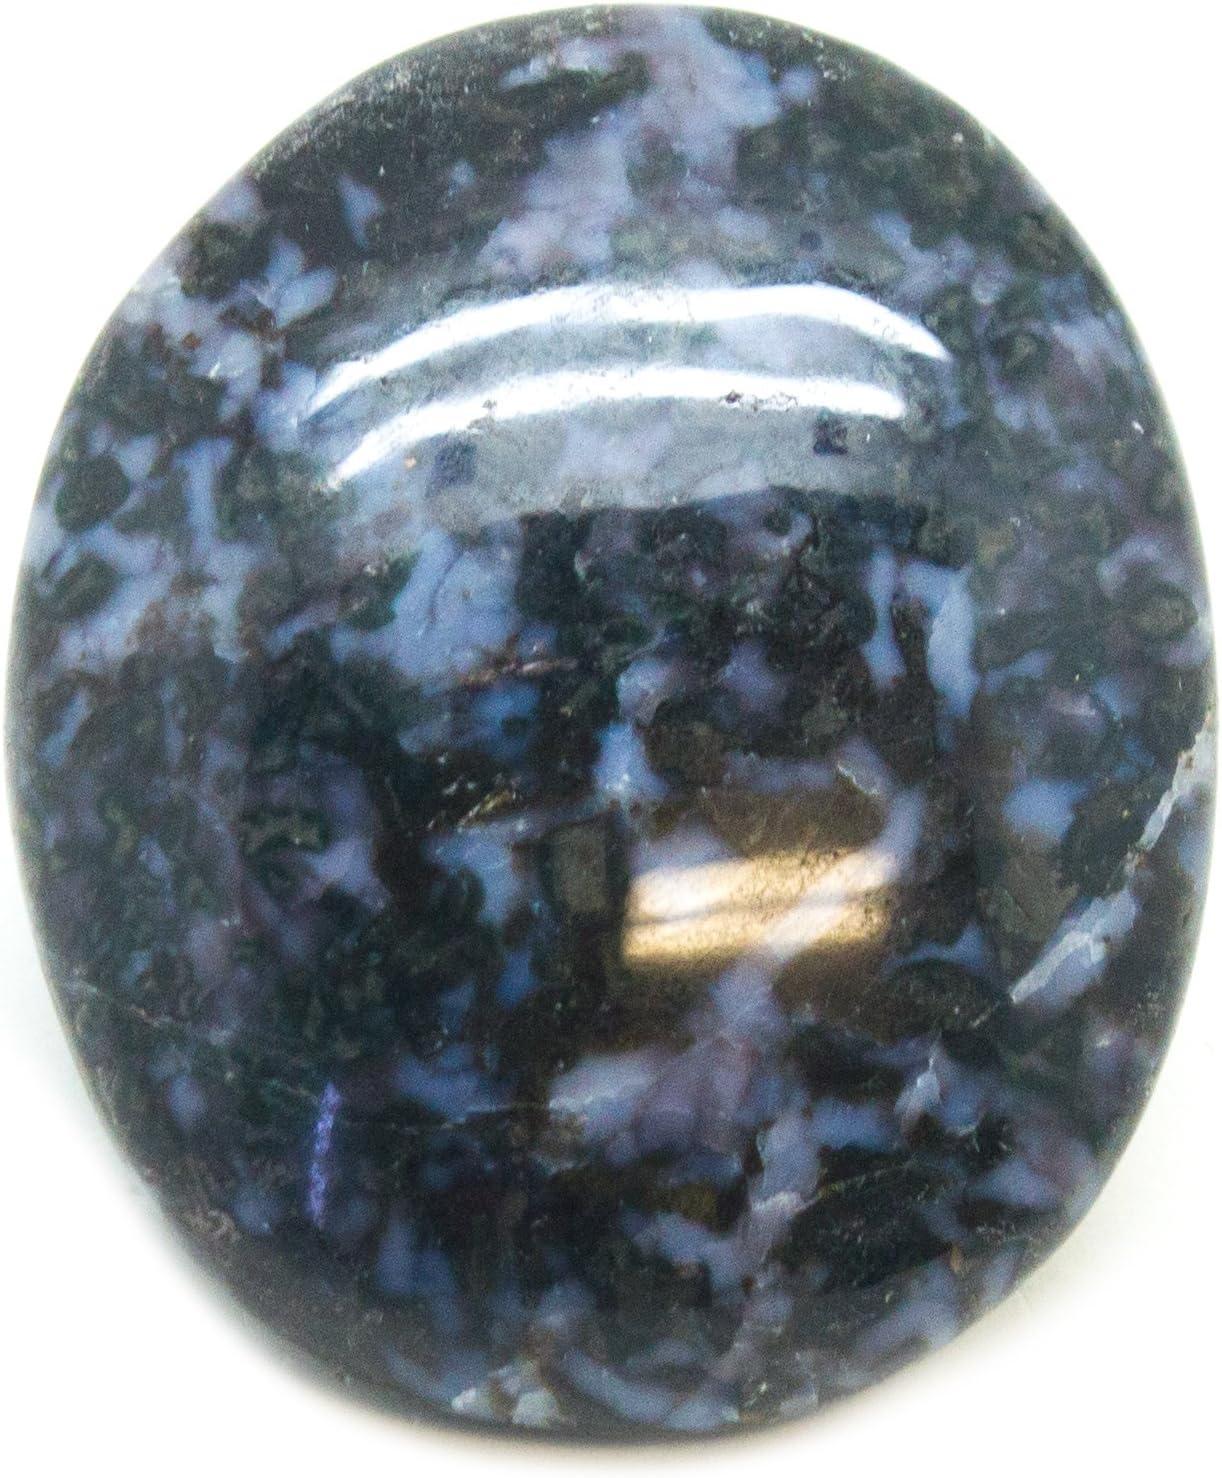 2.6 inch 67mm Large Indigo Gabbro Palm Stone TP01-07 Indigo Gabbro Tumbled Stone